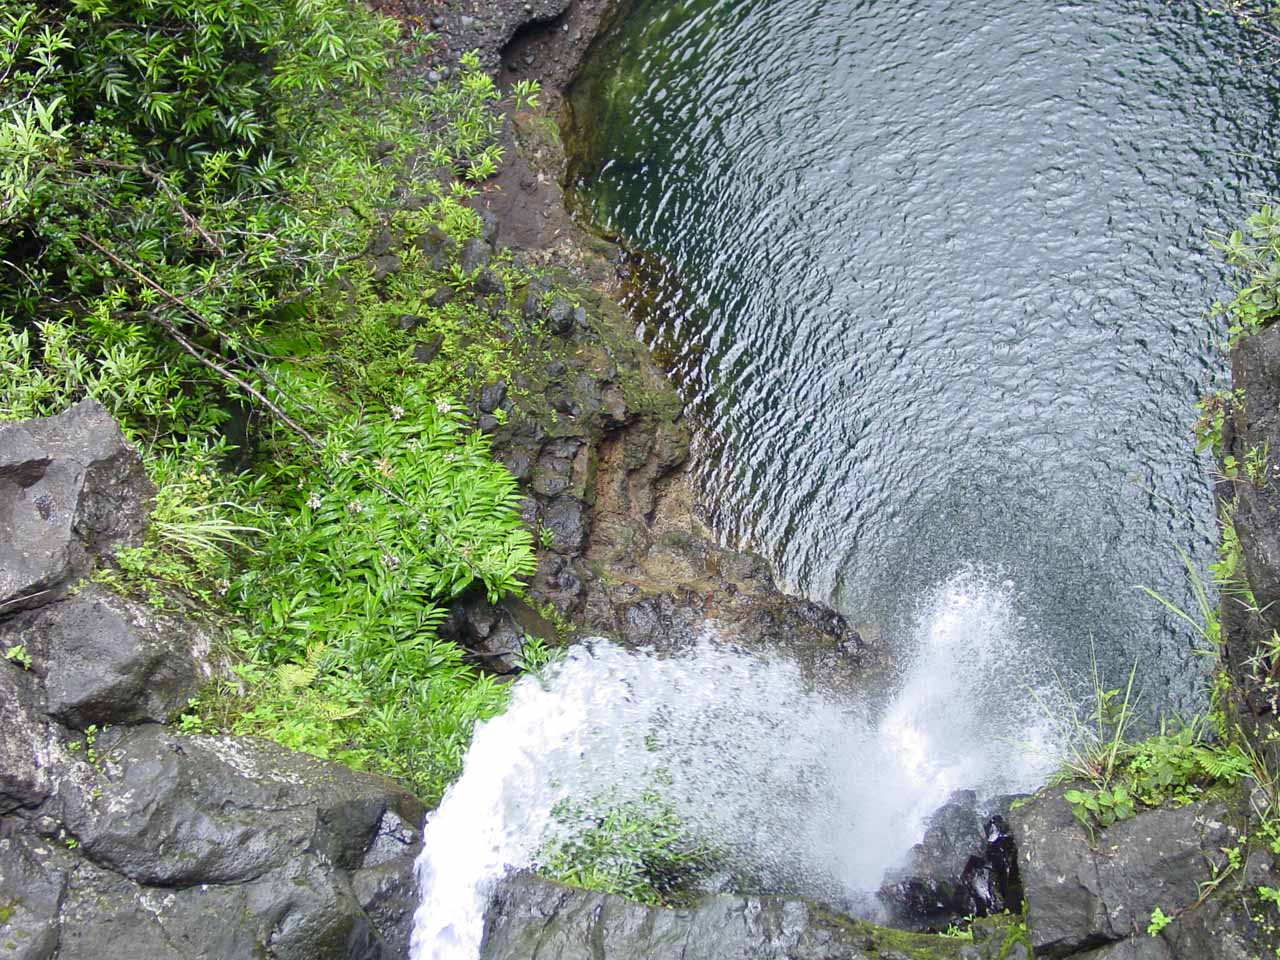 Makapipi Falls